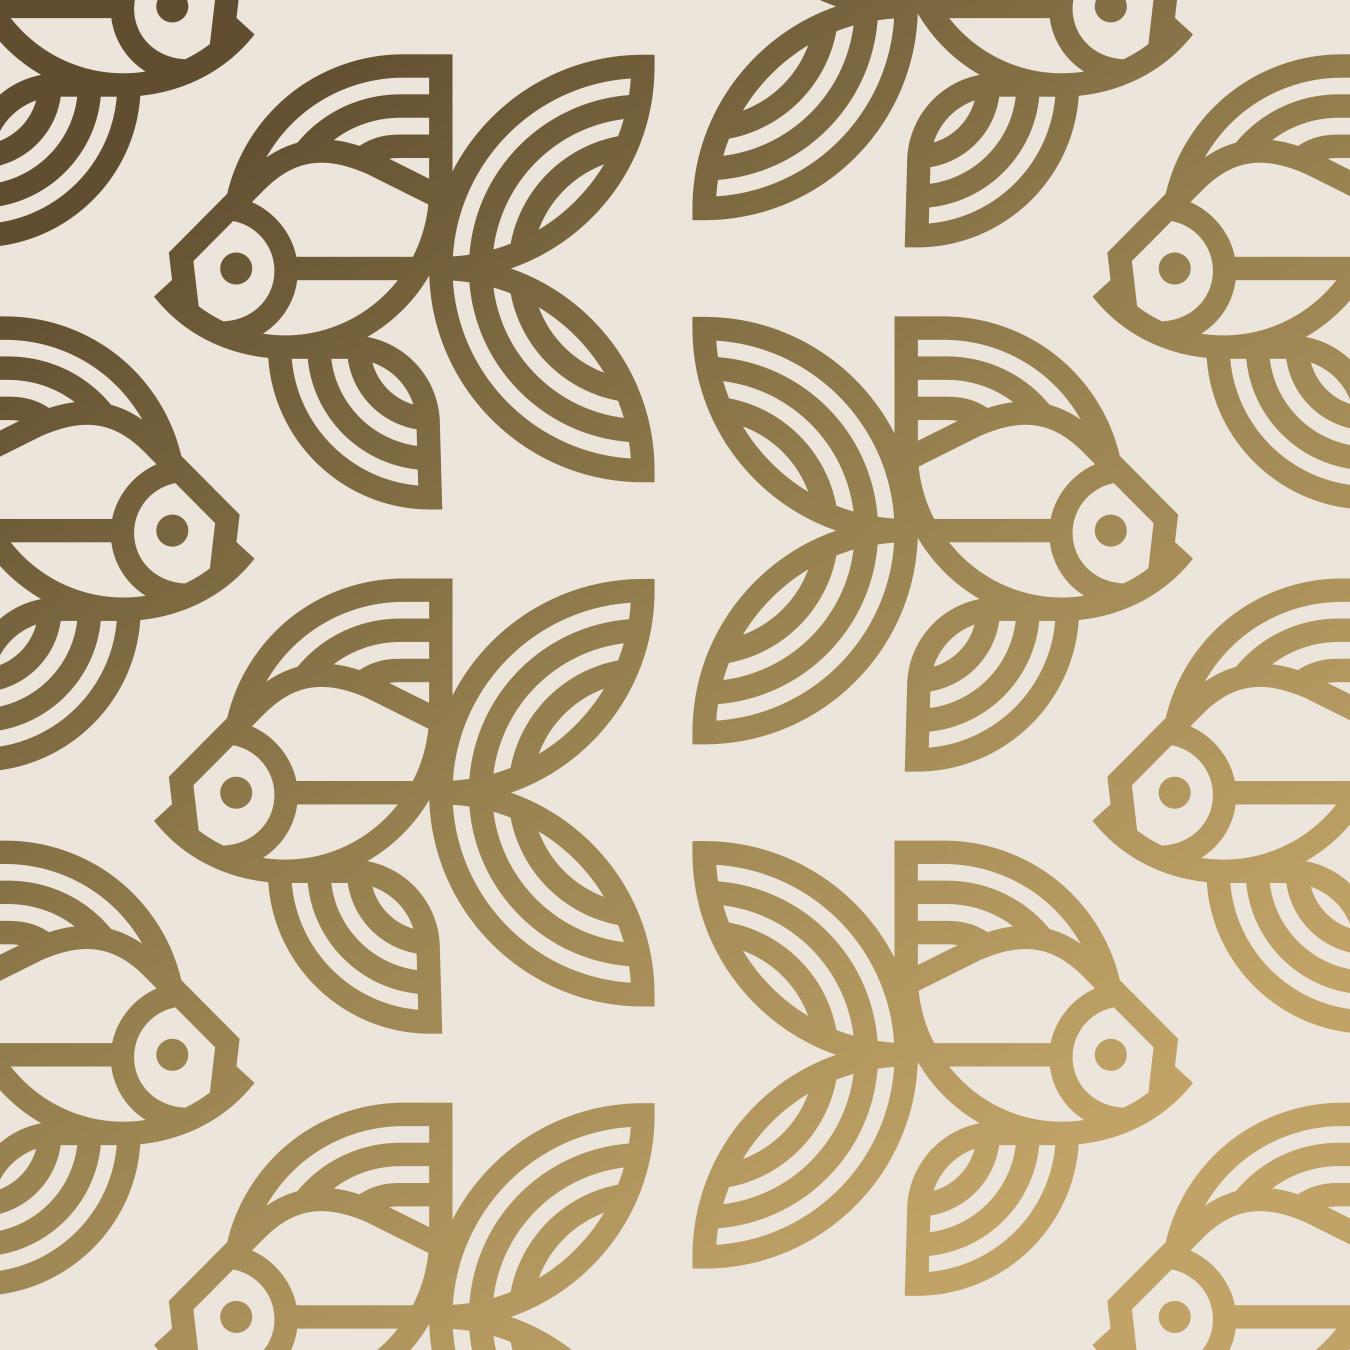 Caviar & Bananas Goldfish Pattern